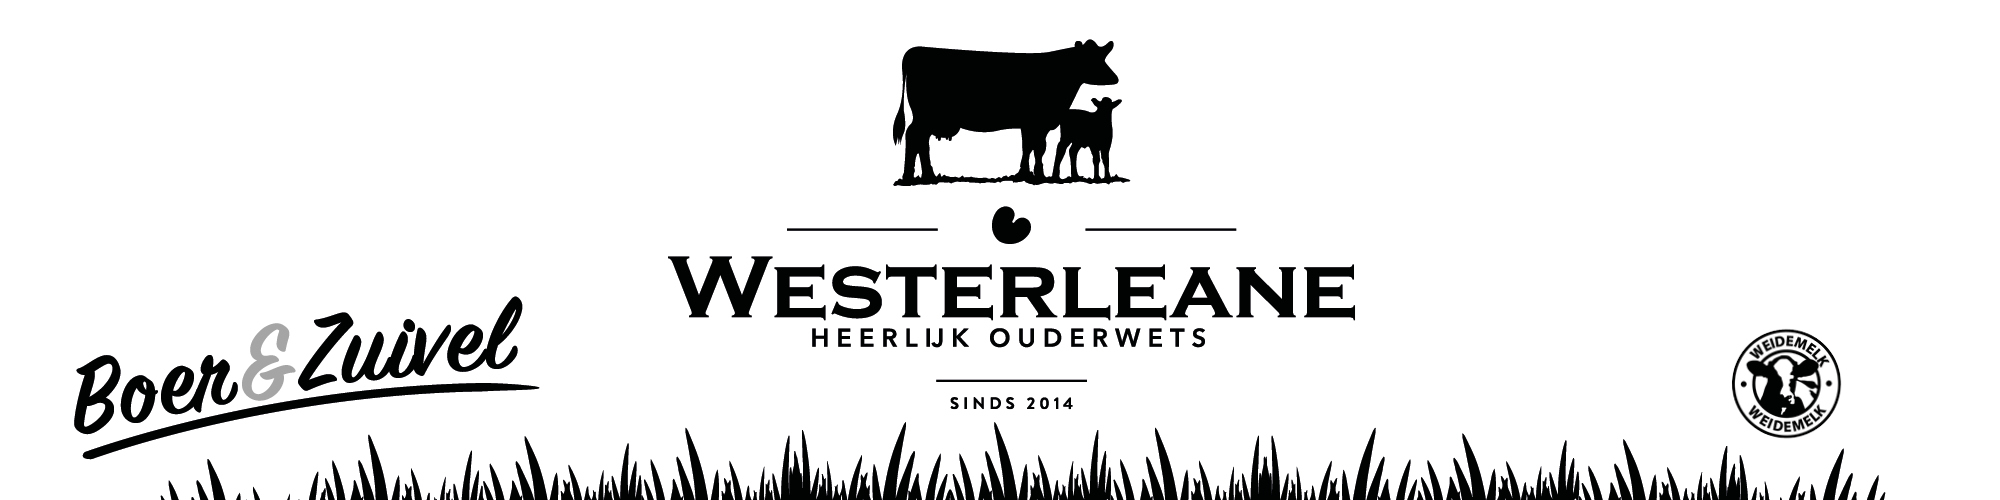 Westerleane.nl